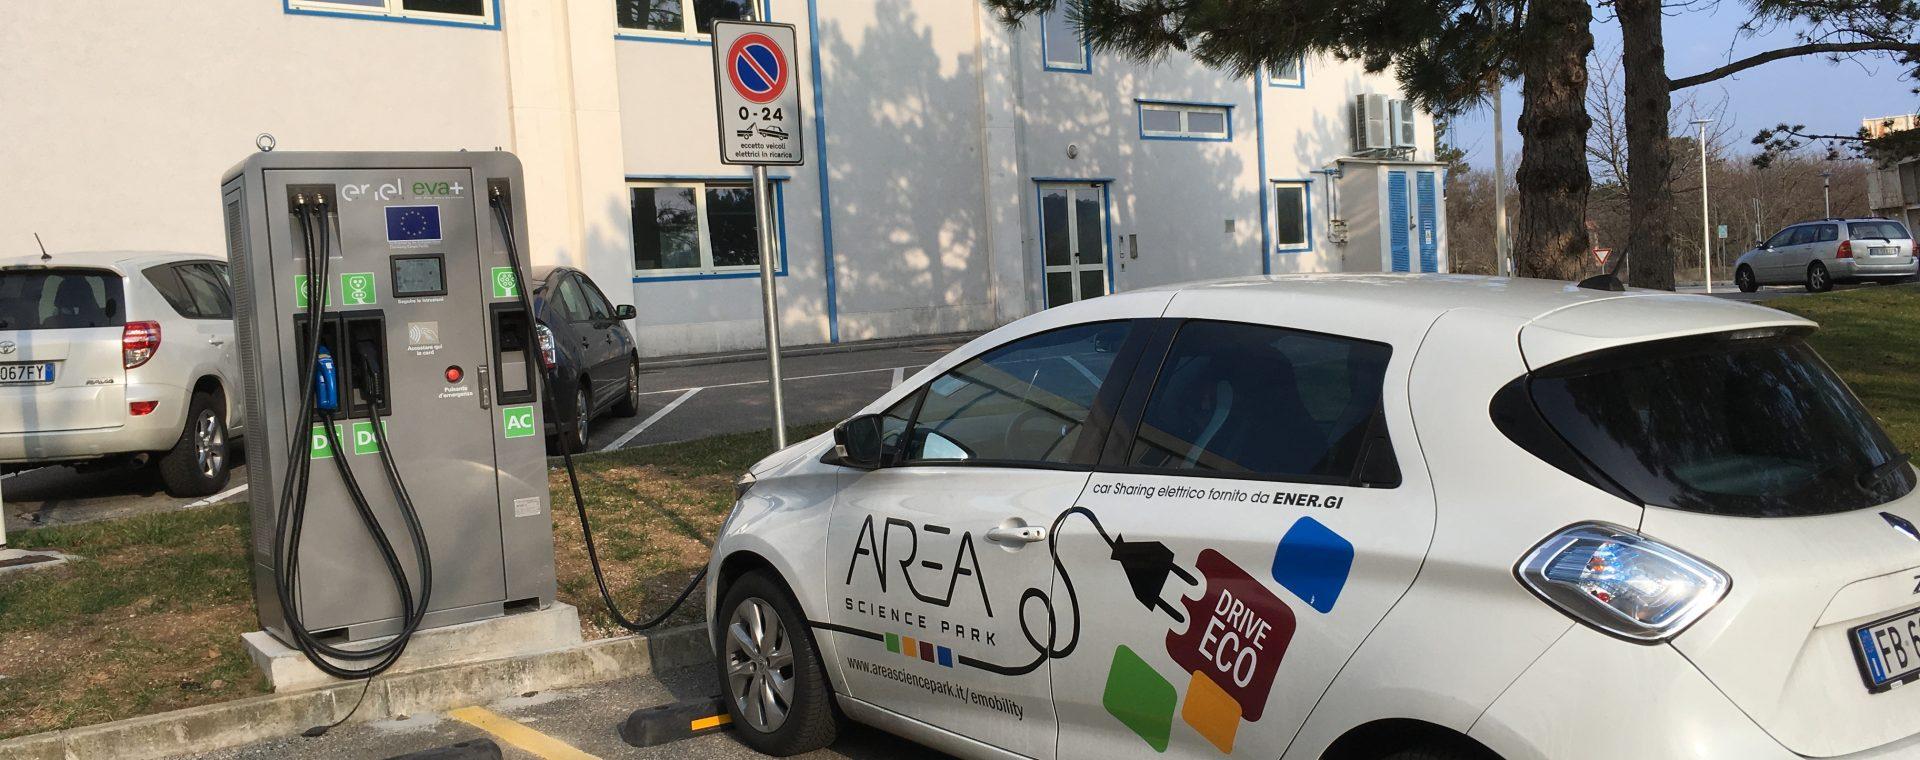 Mobilità elettrica: trasporti, ambiente, energia